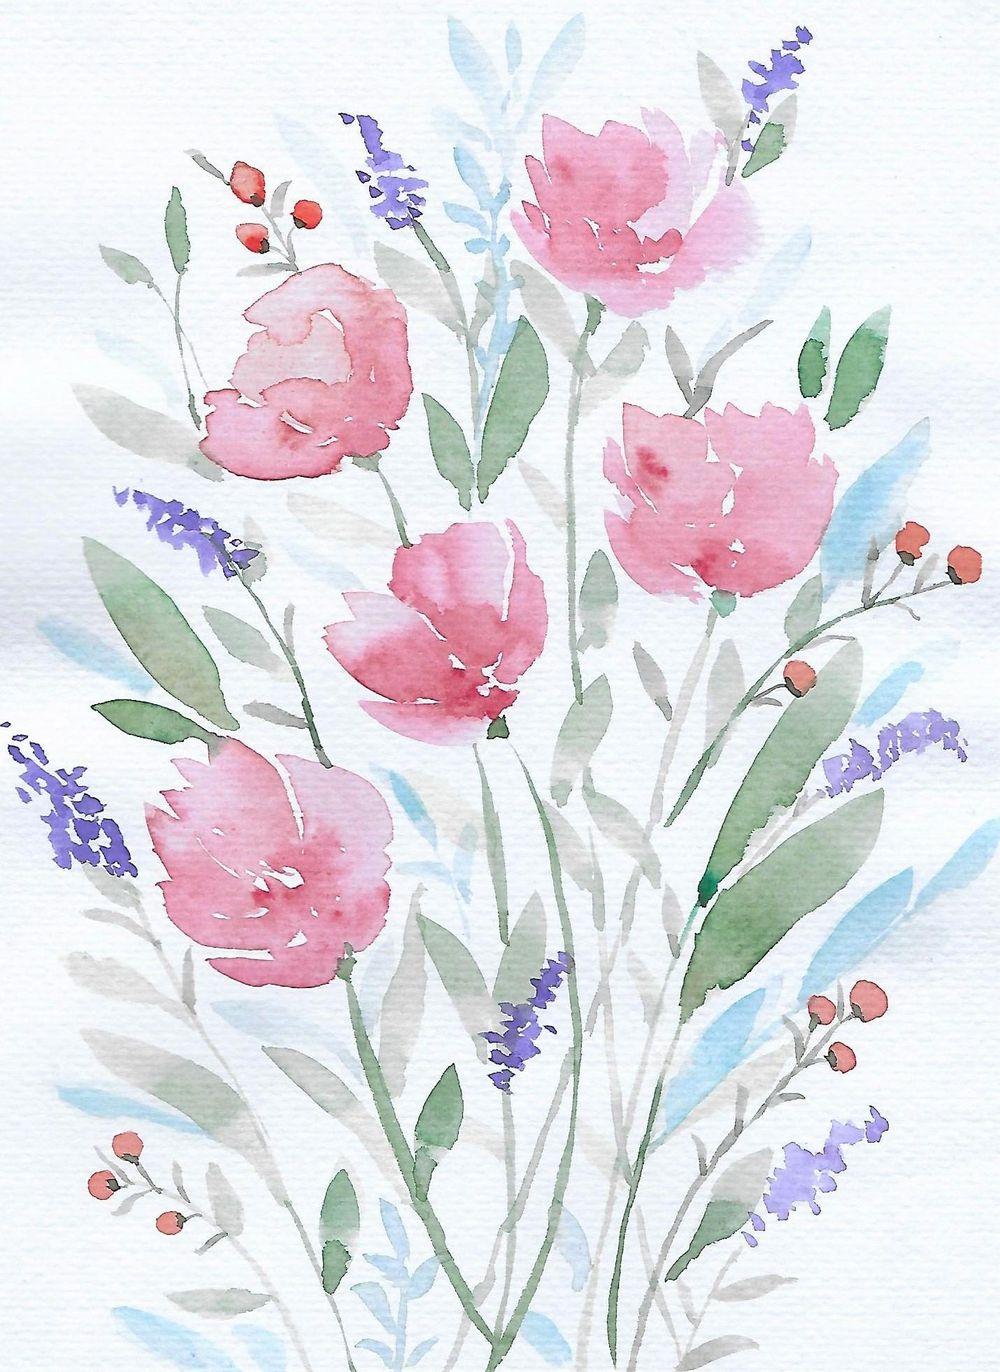 Watercolour techniques - image 1 - student project